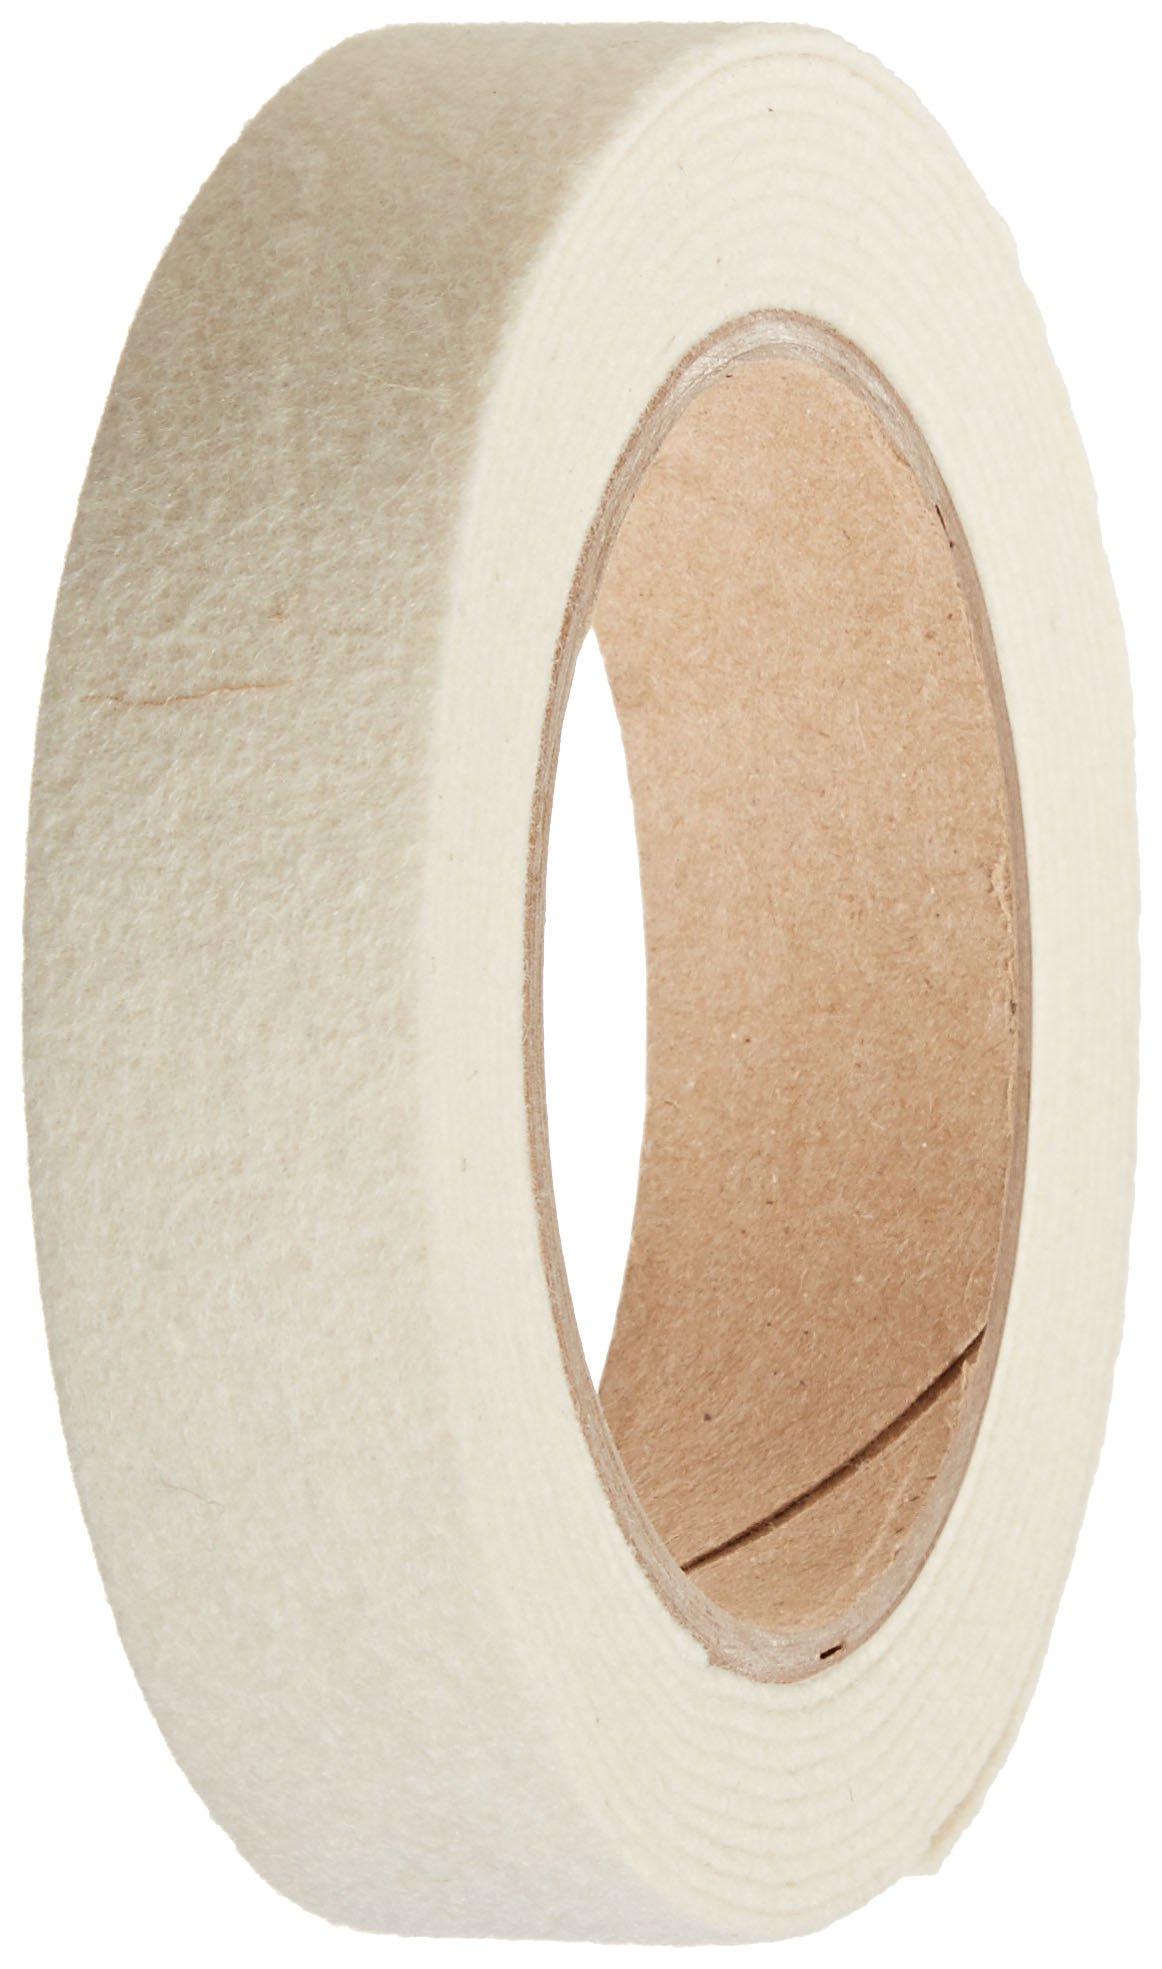 Grade F50 Pressed Wool Felt Strip, White, Meets SAE J314, 1/16'' Thickness, 1'' Width, 25' Length